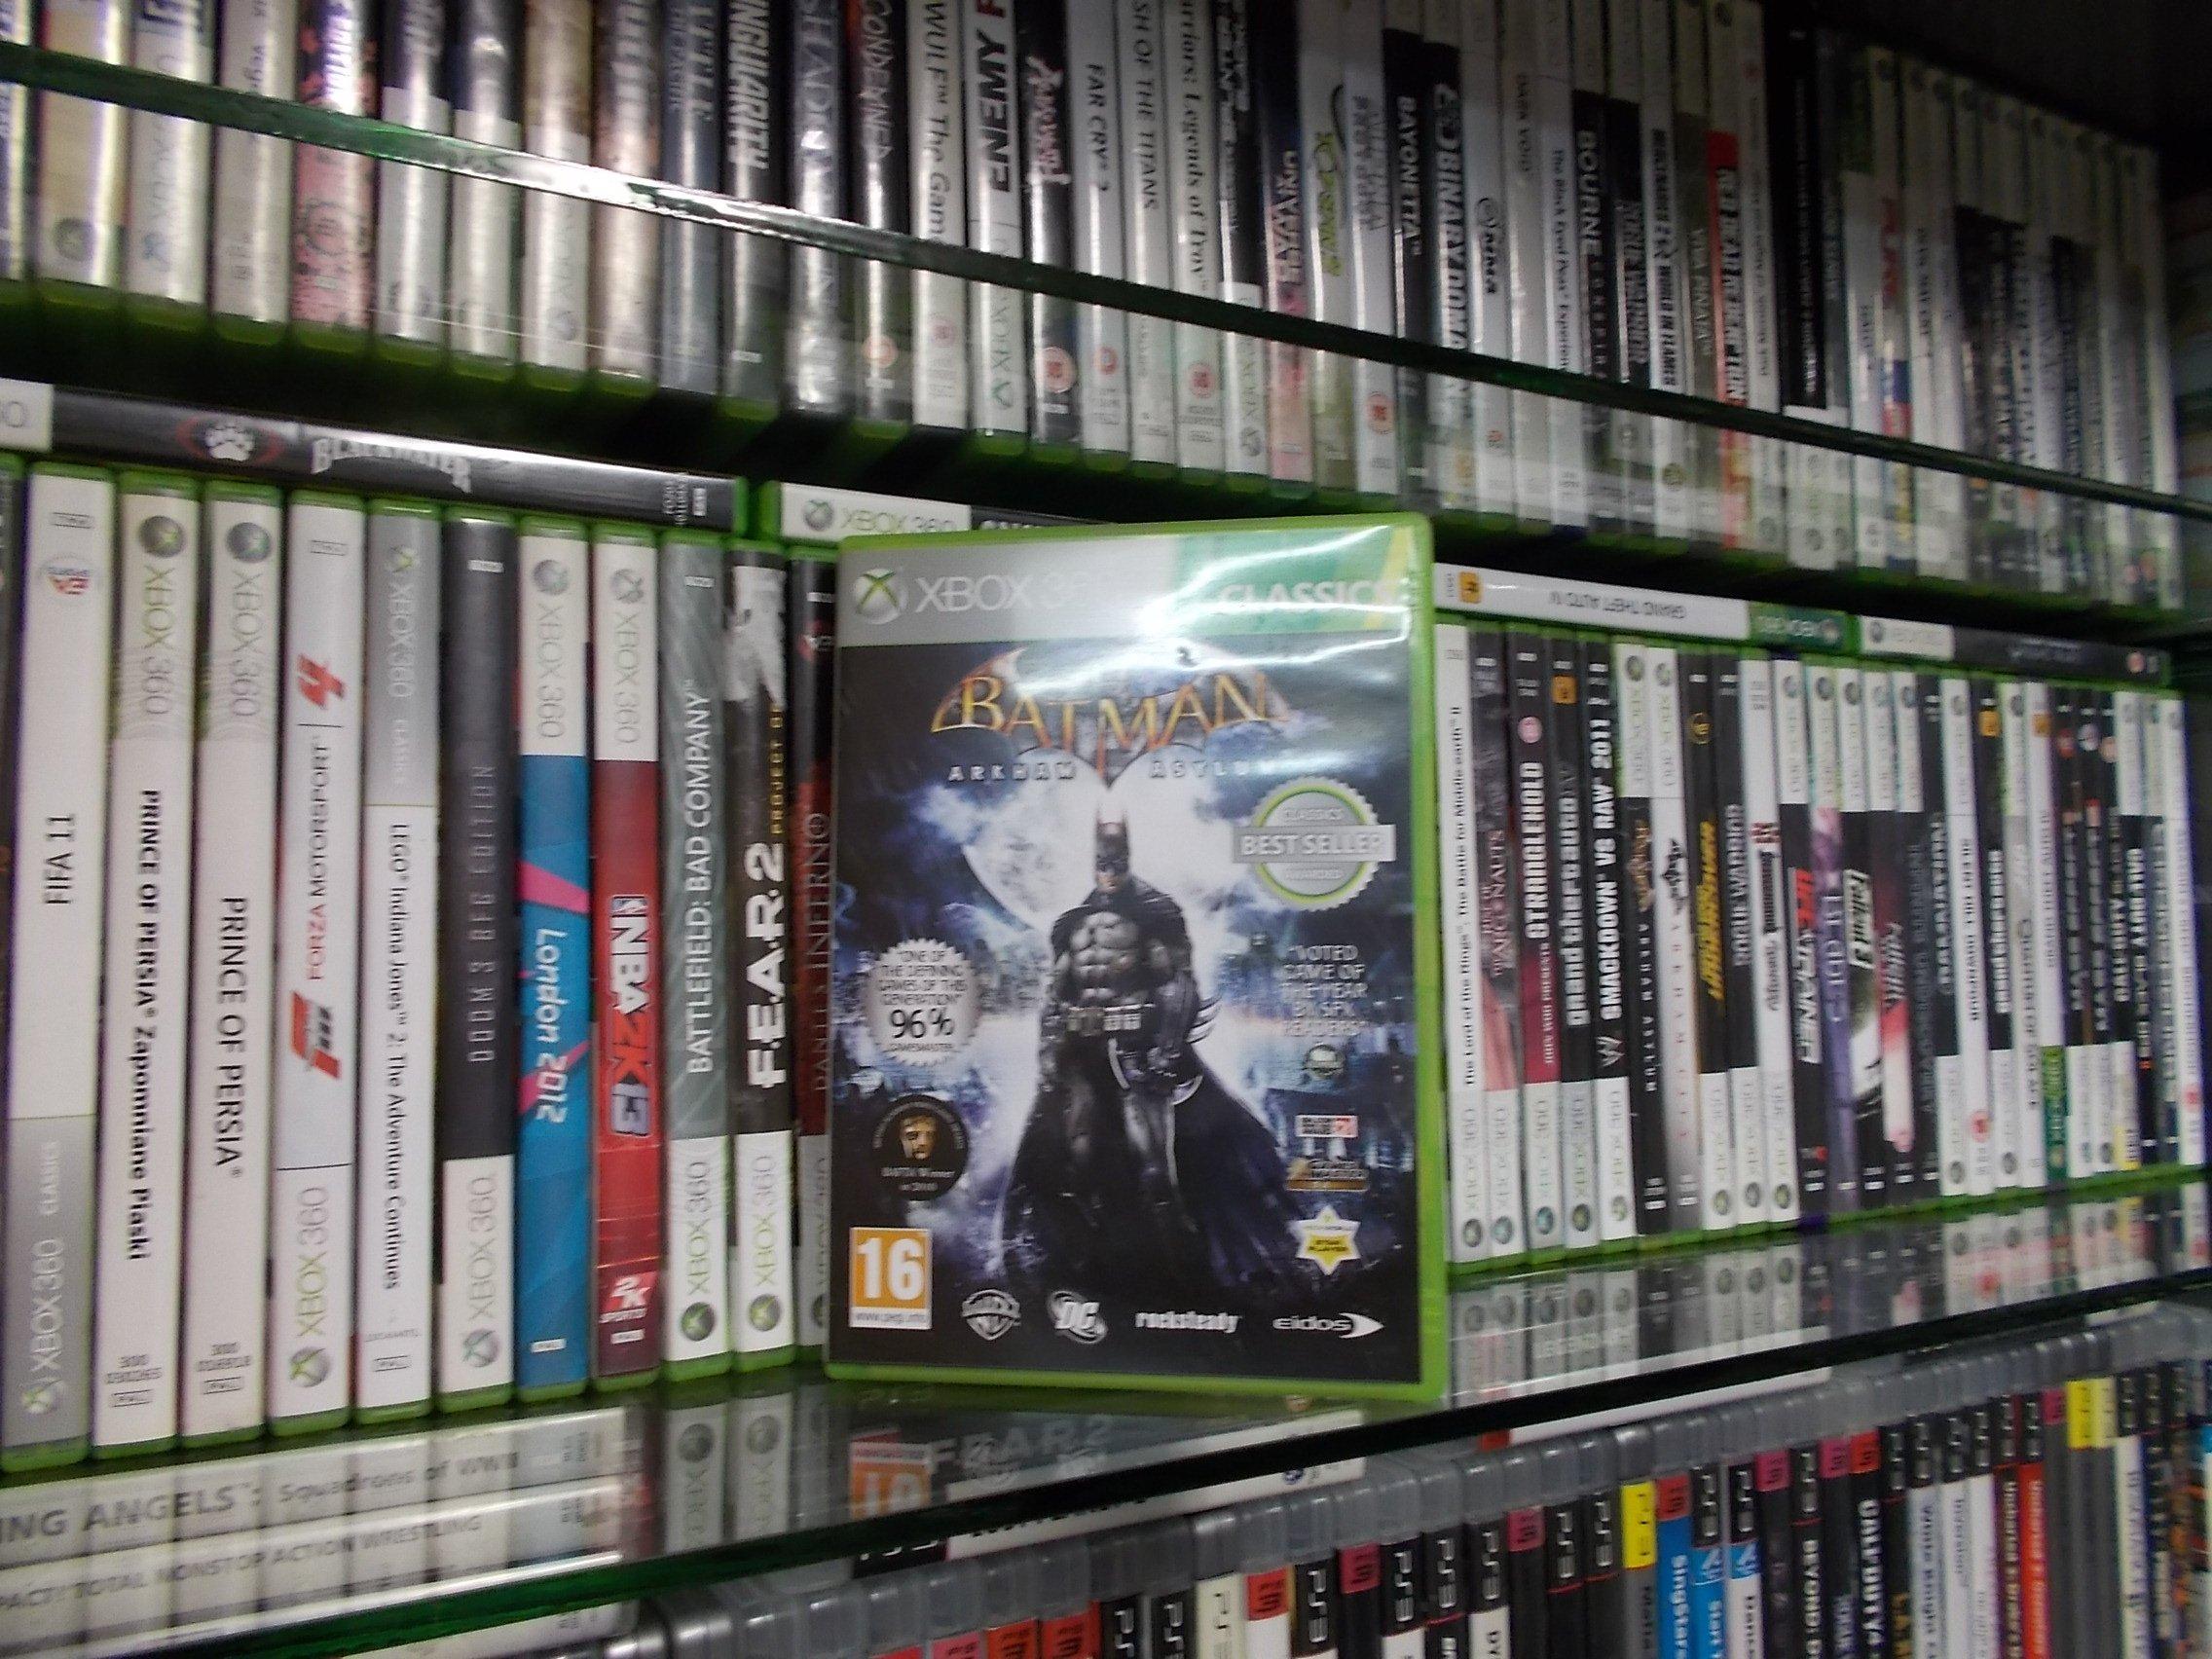 Batman Arkham Asylum - GRA XBOX 360 Sklep